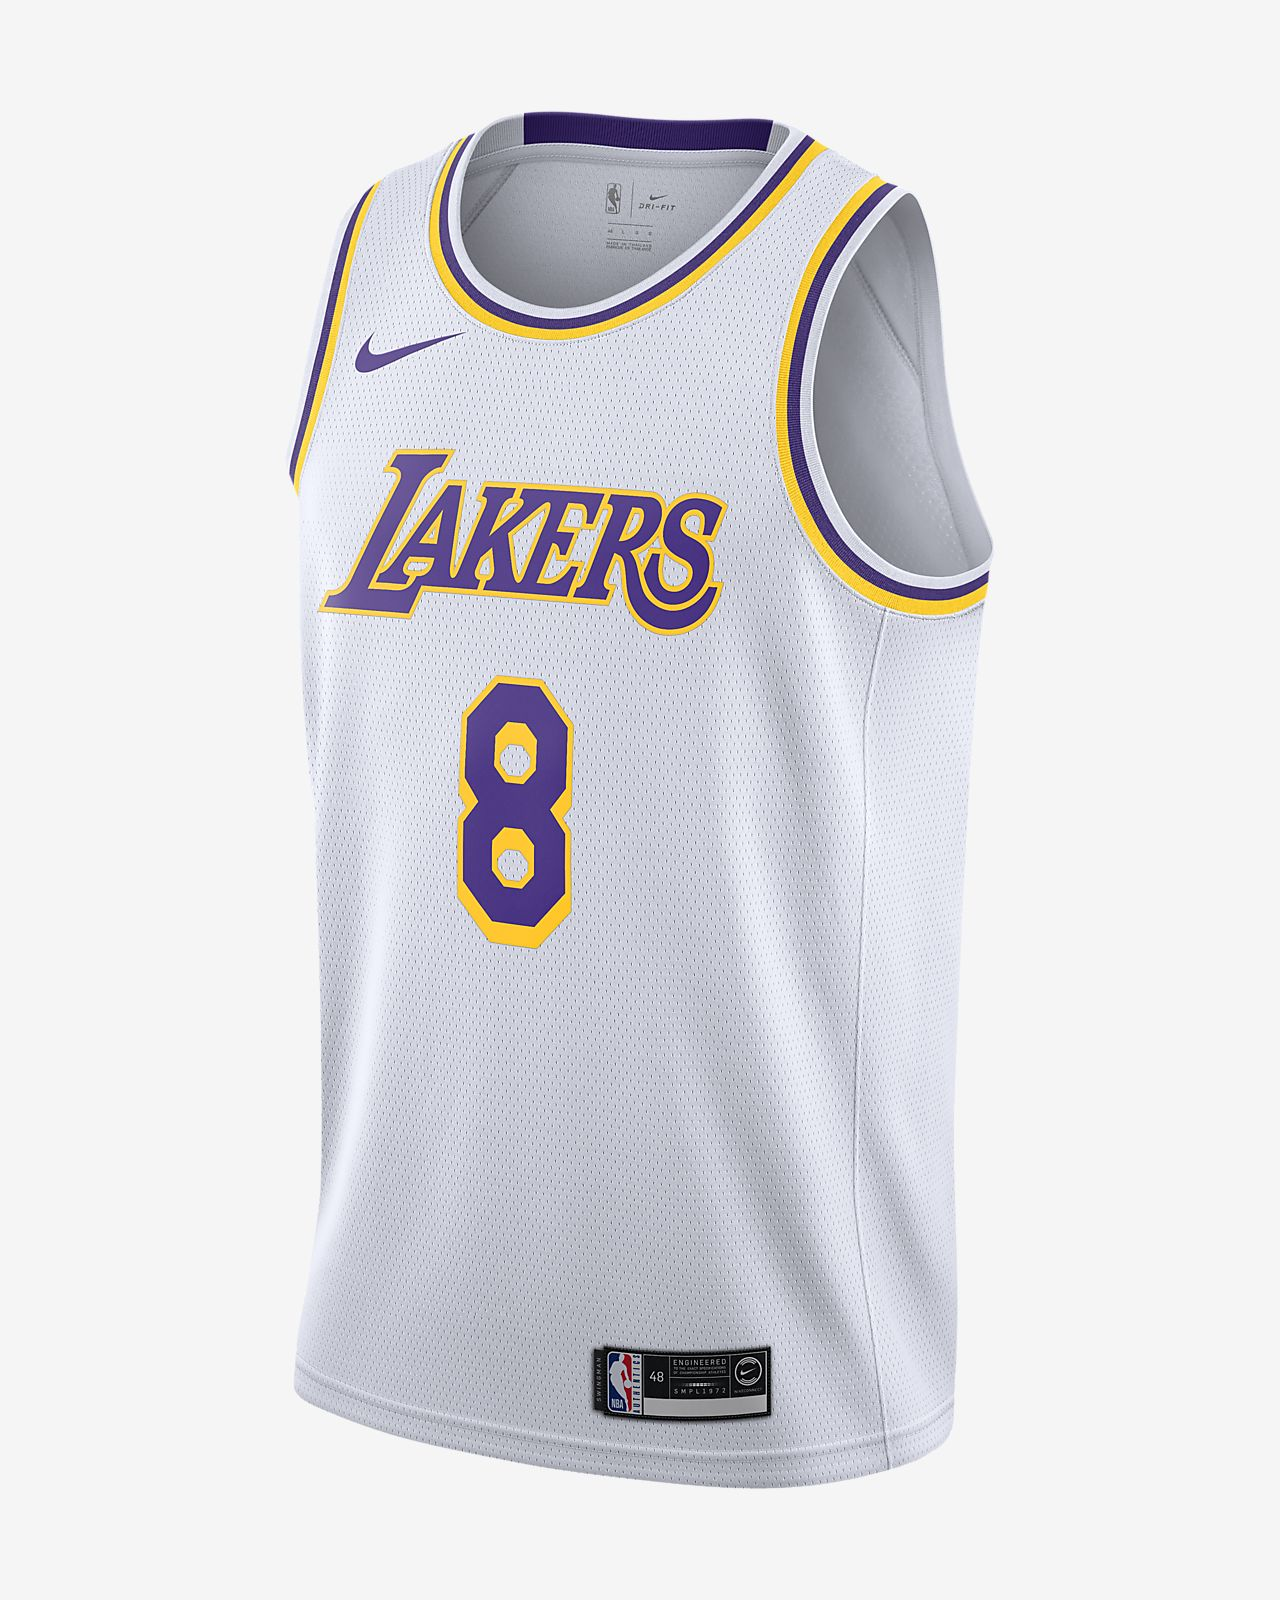 Camiseta Nike NBA Swingman Kobe Bryant Lakers Association Edition